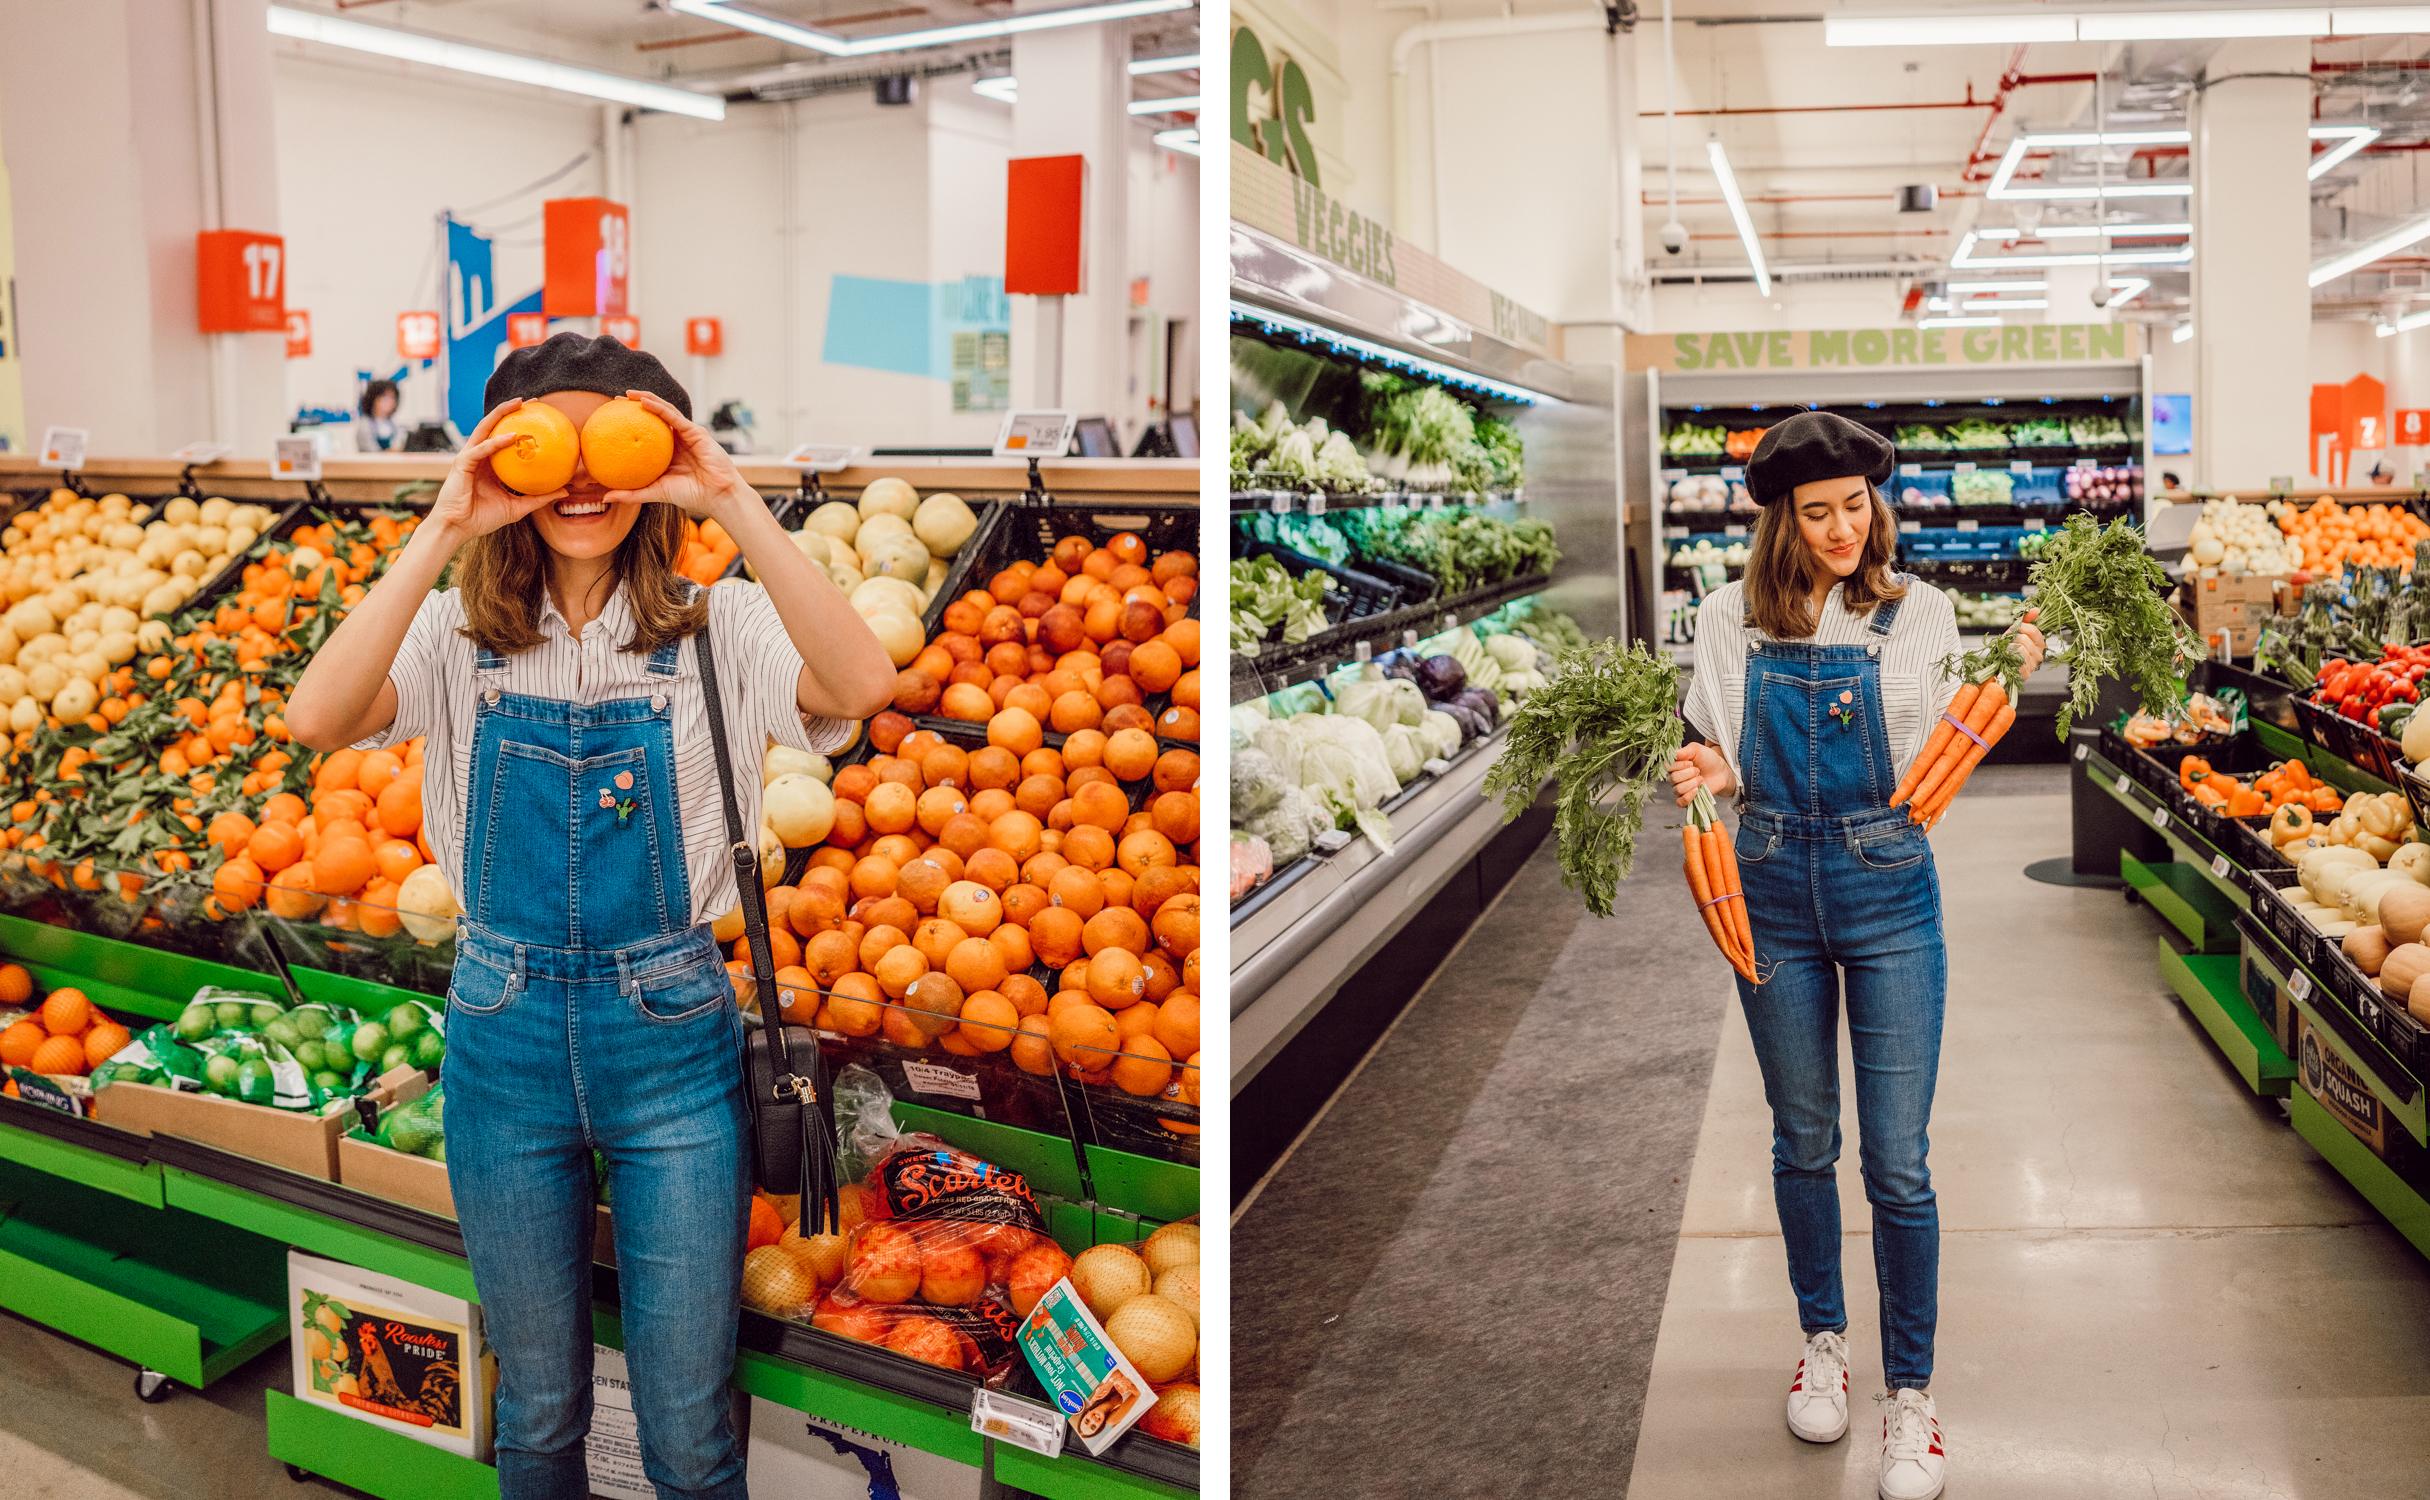 whole foods market 365 - 4